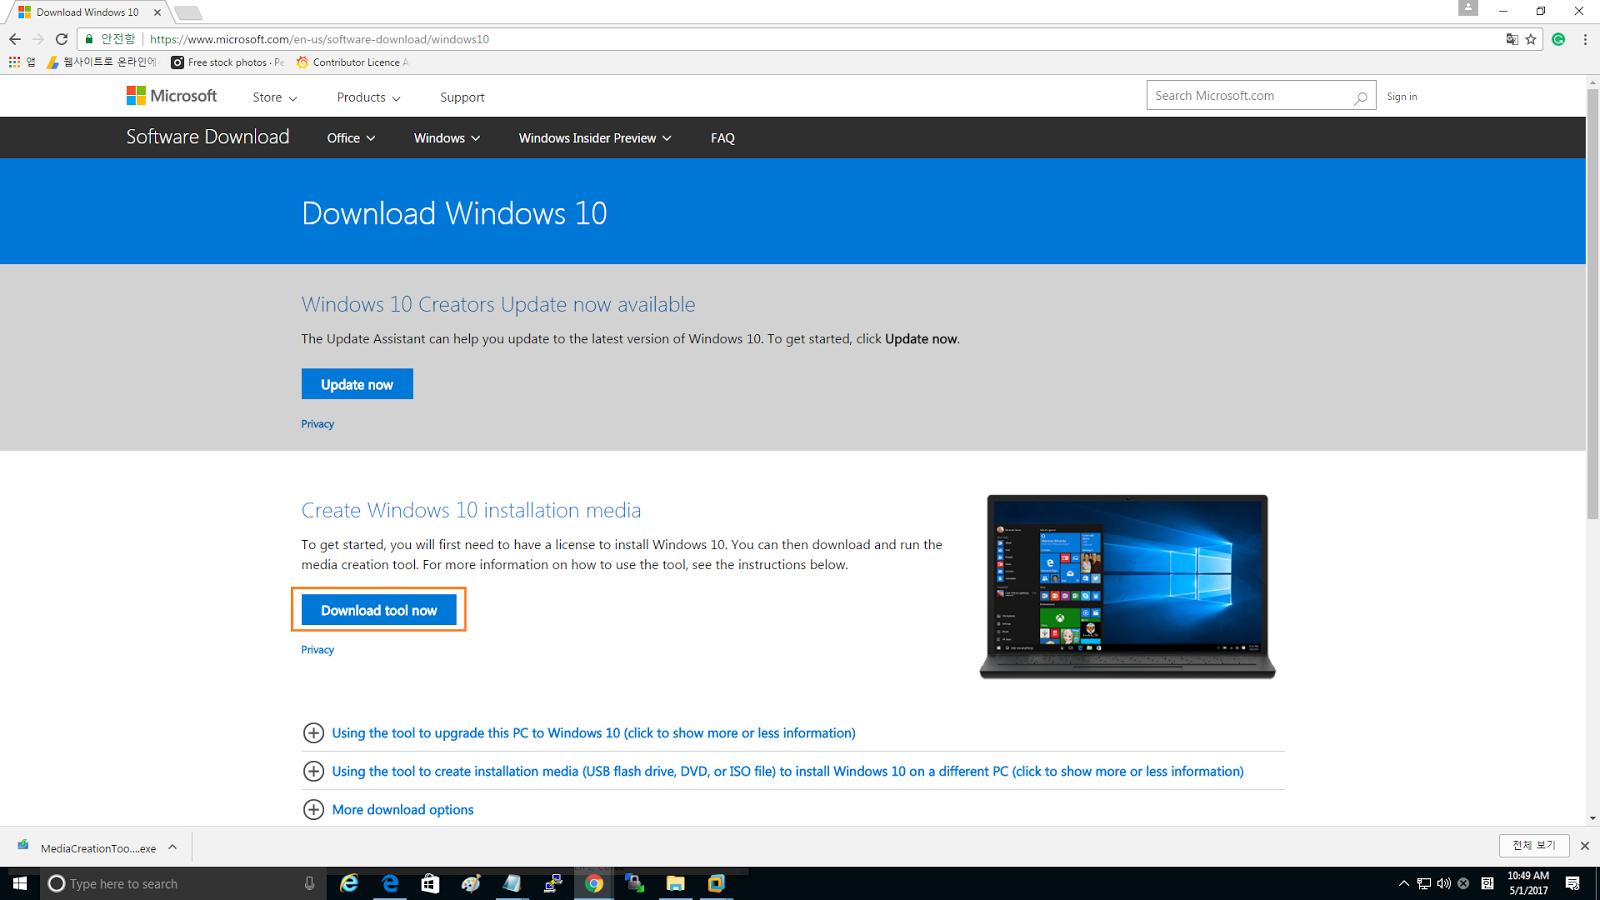 Sunguru IT Channel 01: How to install Windows 10 on a